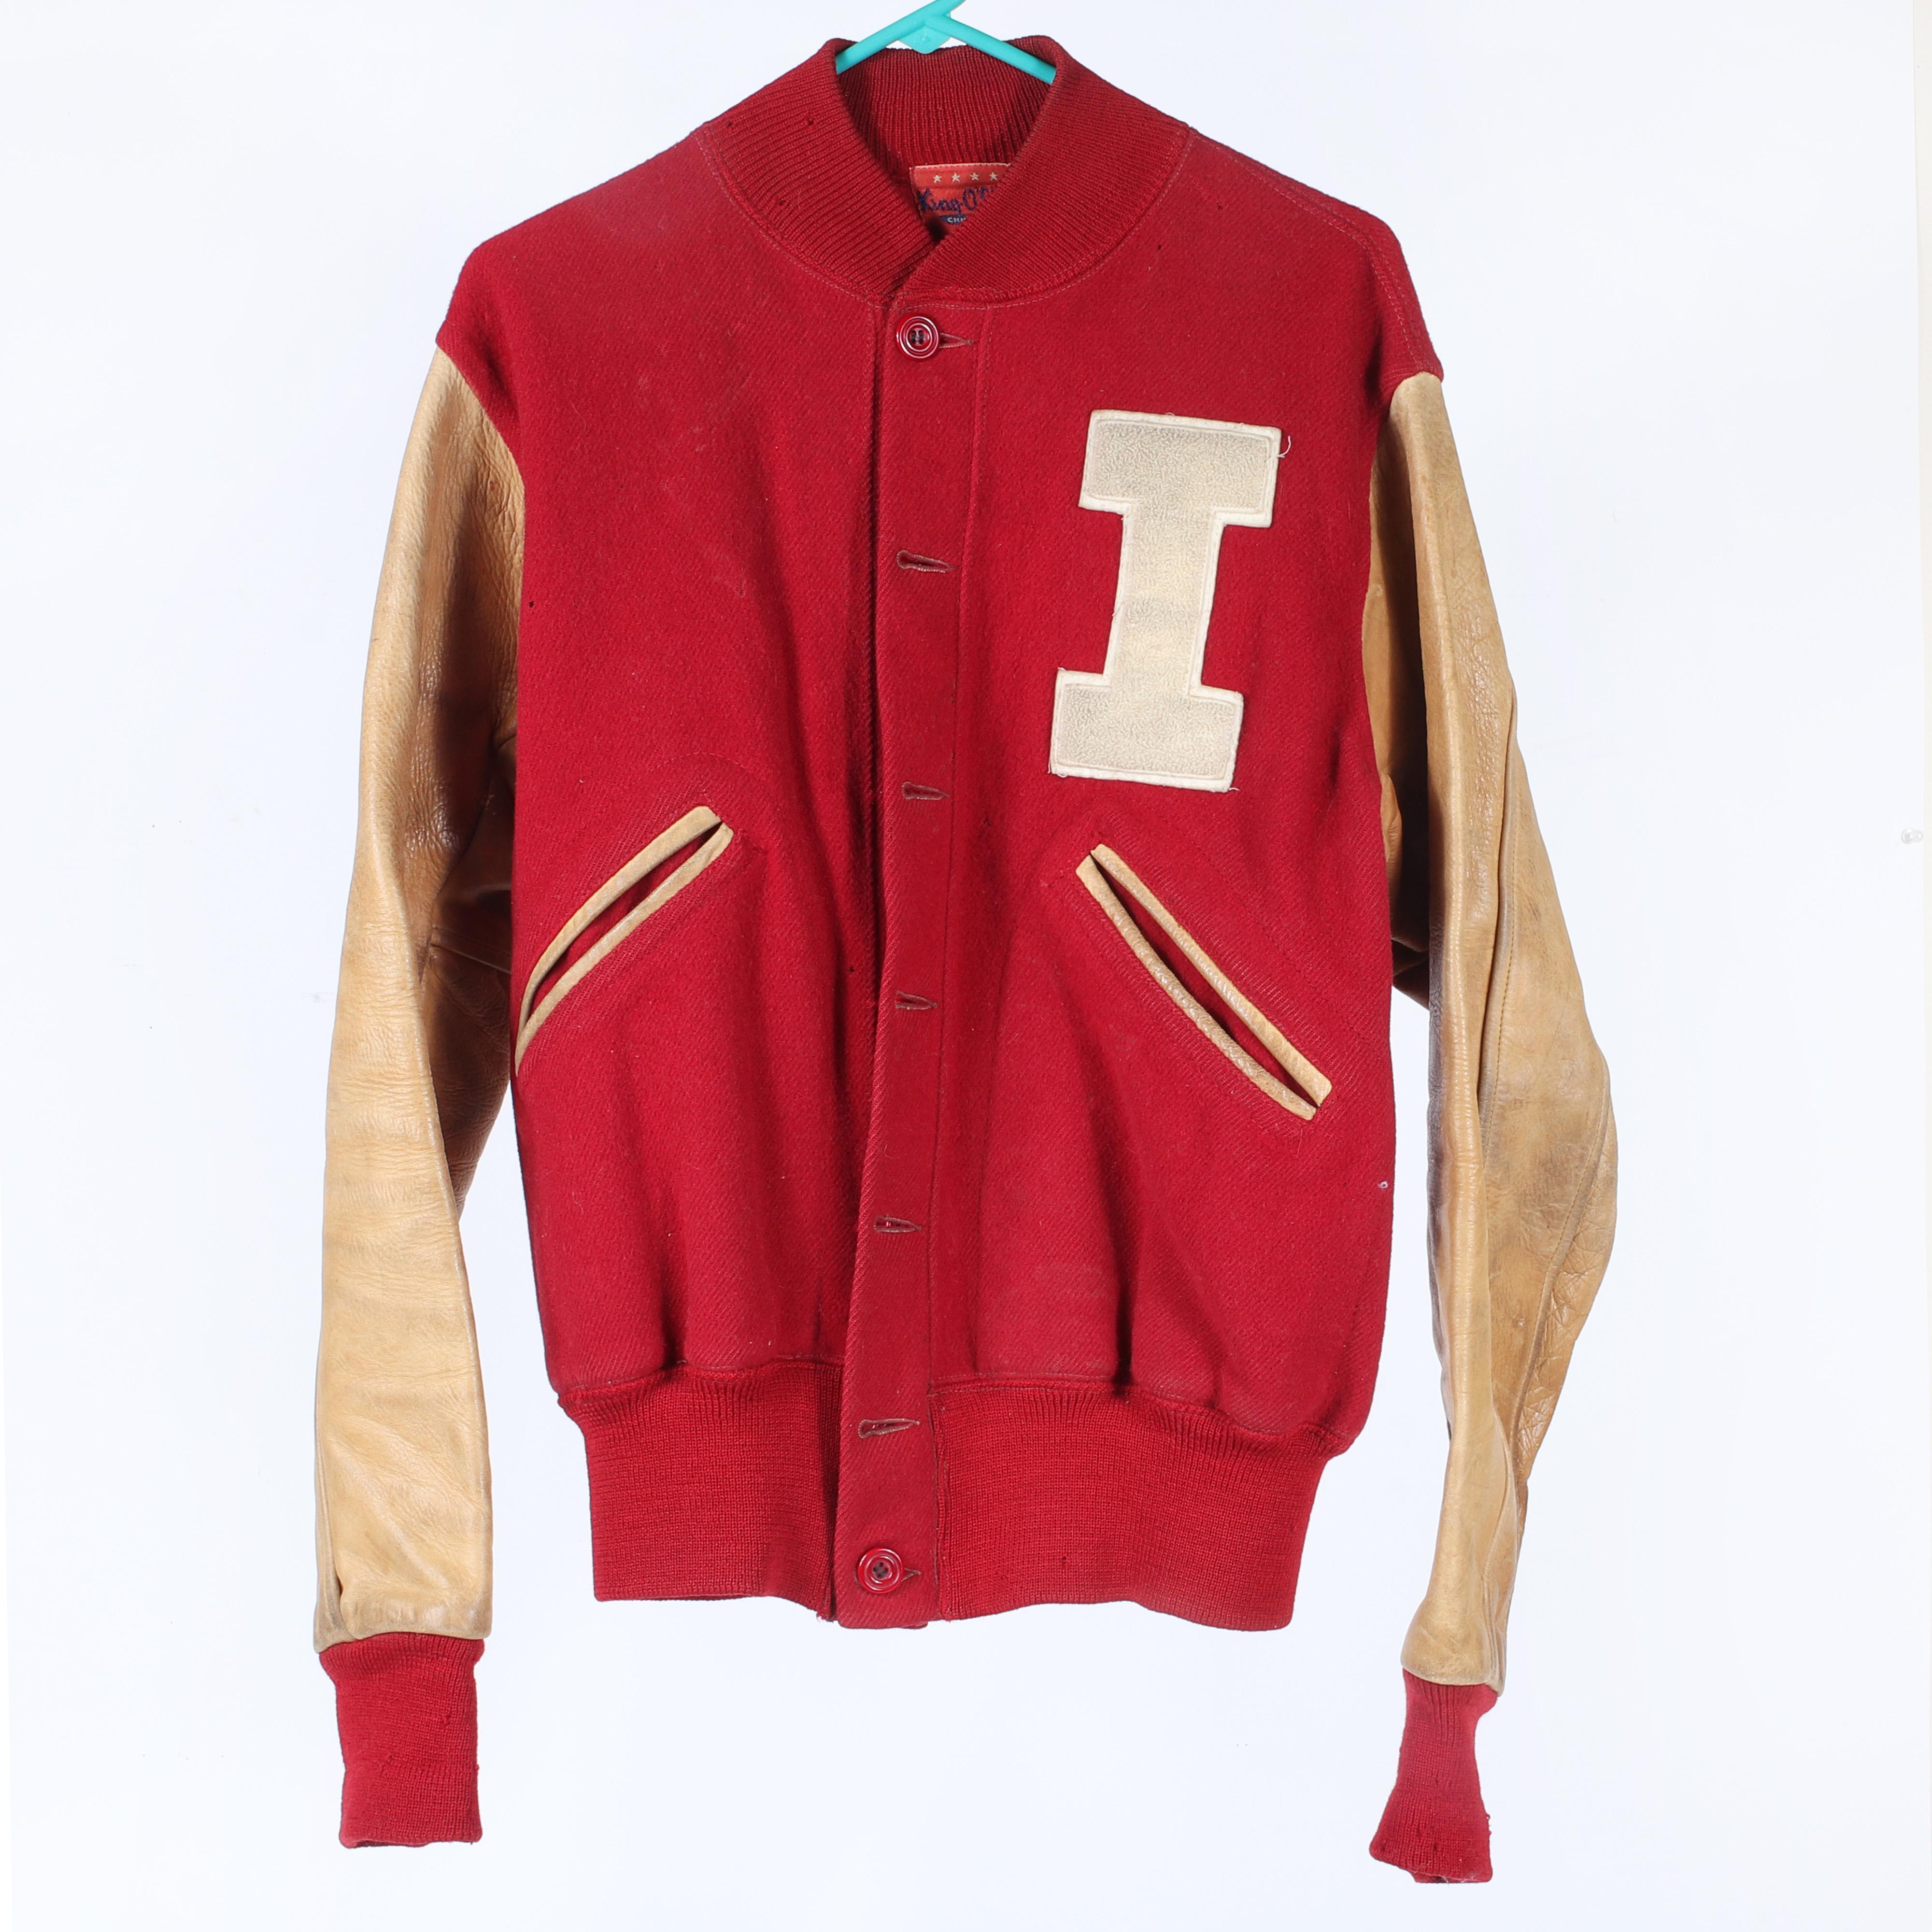 Vintage 1950's Indiana University Letter Jacket